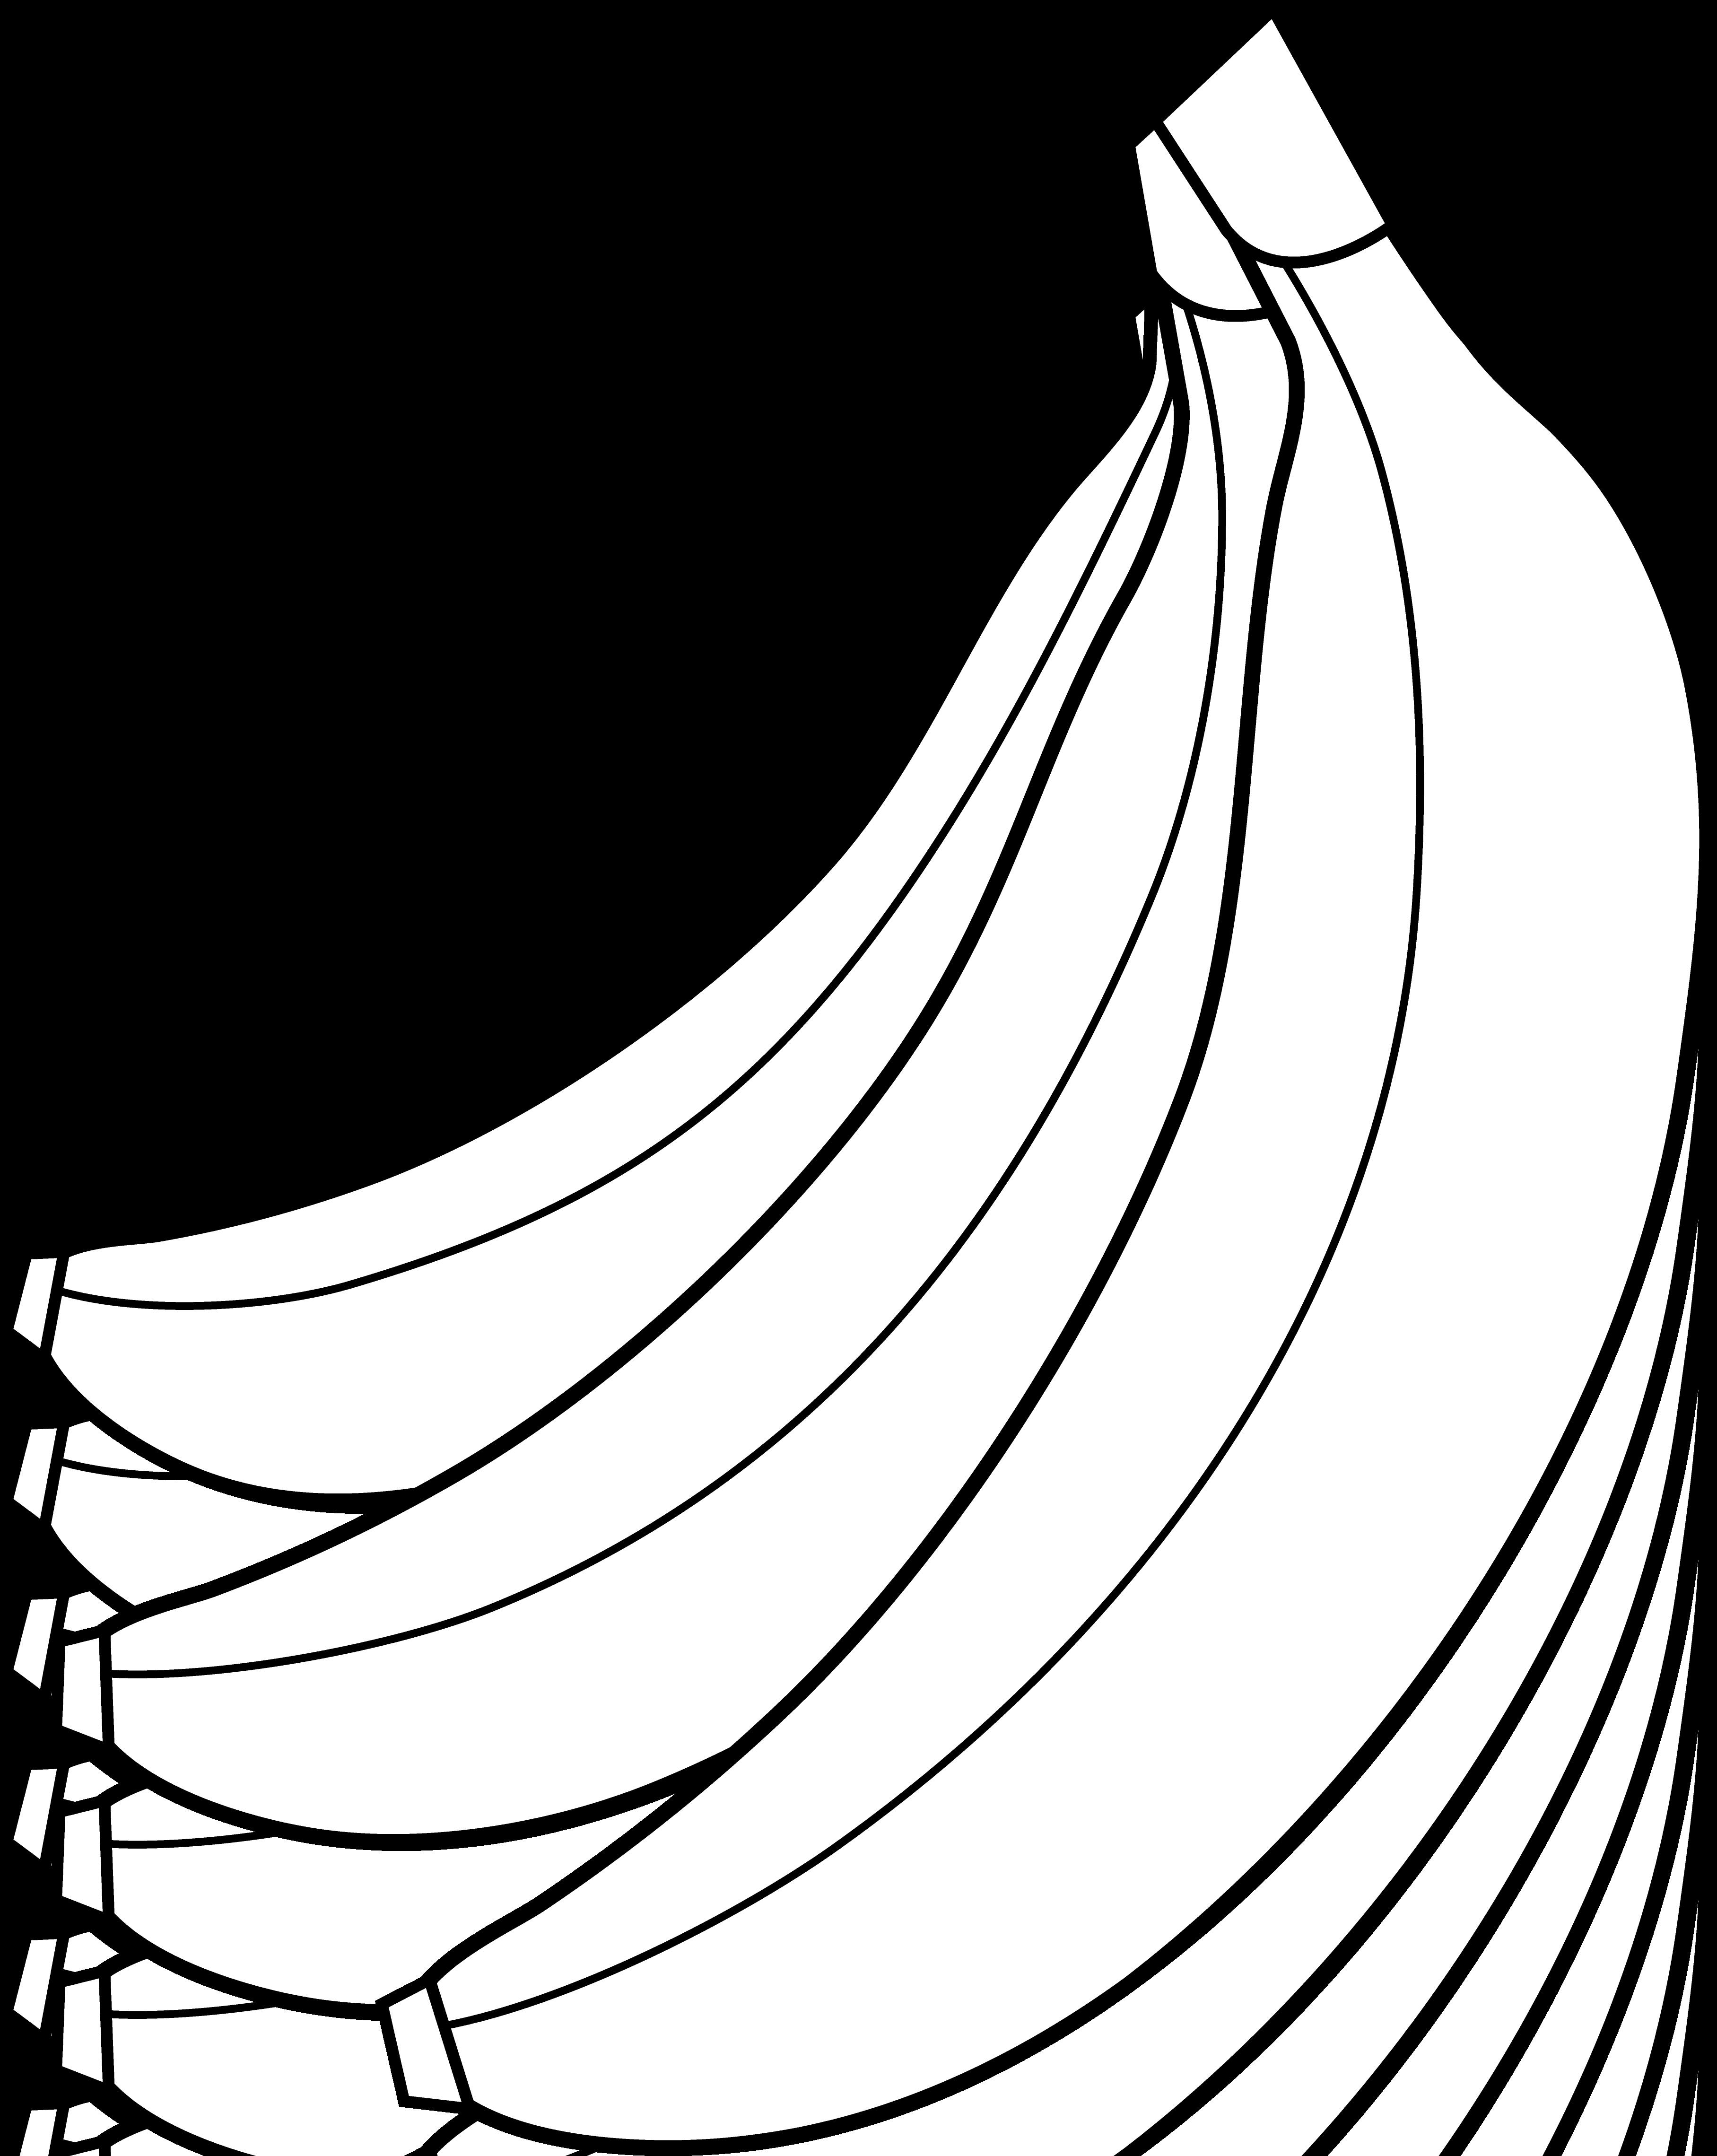 Solid black pumpkin clipart image freeuse stock Banana Clipart Black And White | Clipart Panda - Free Clipart Images image freeuse stock